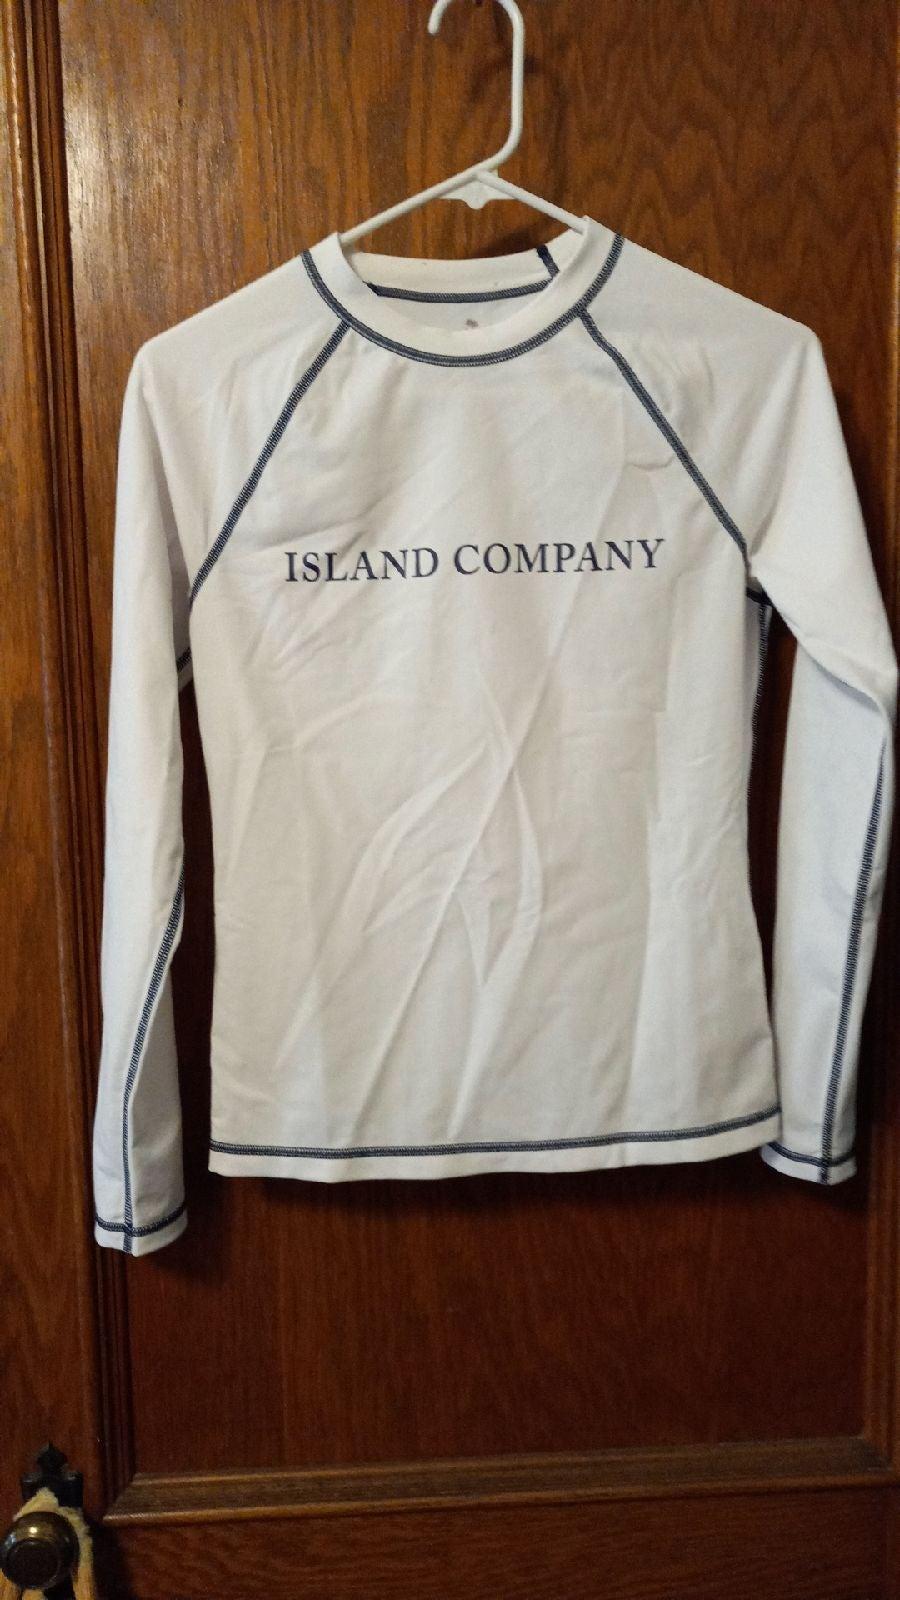 Island company long sleeve